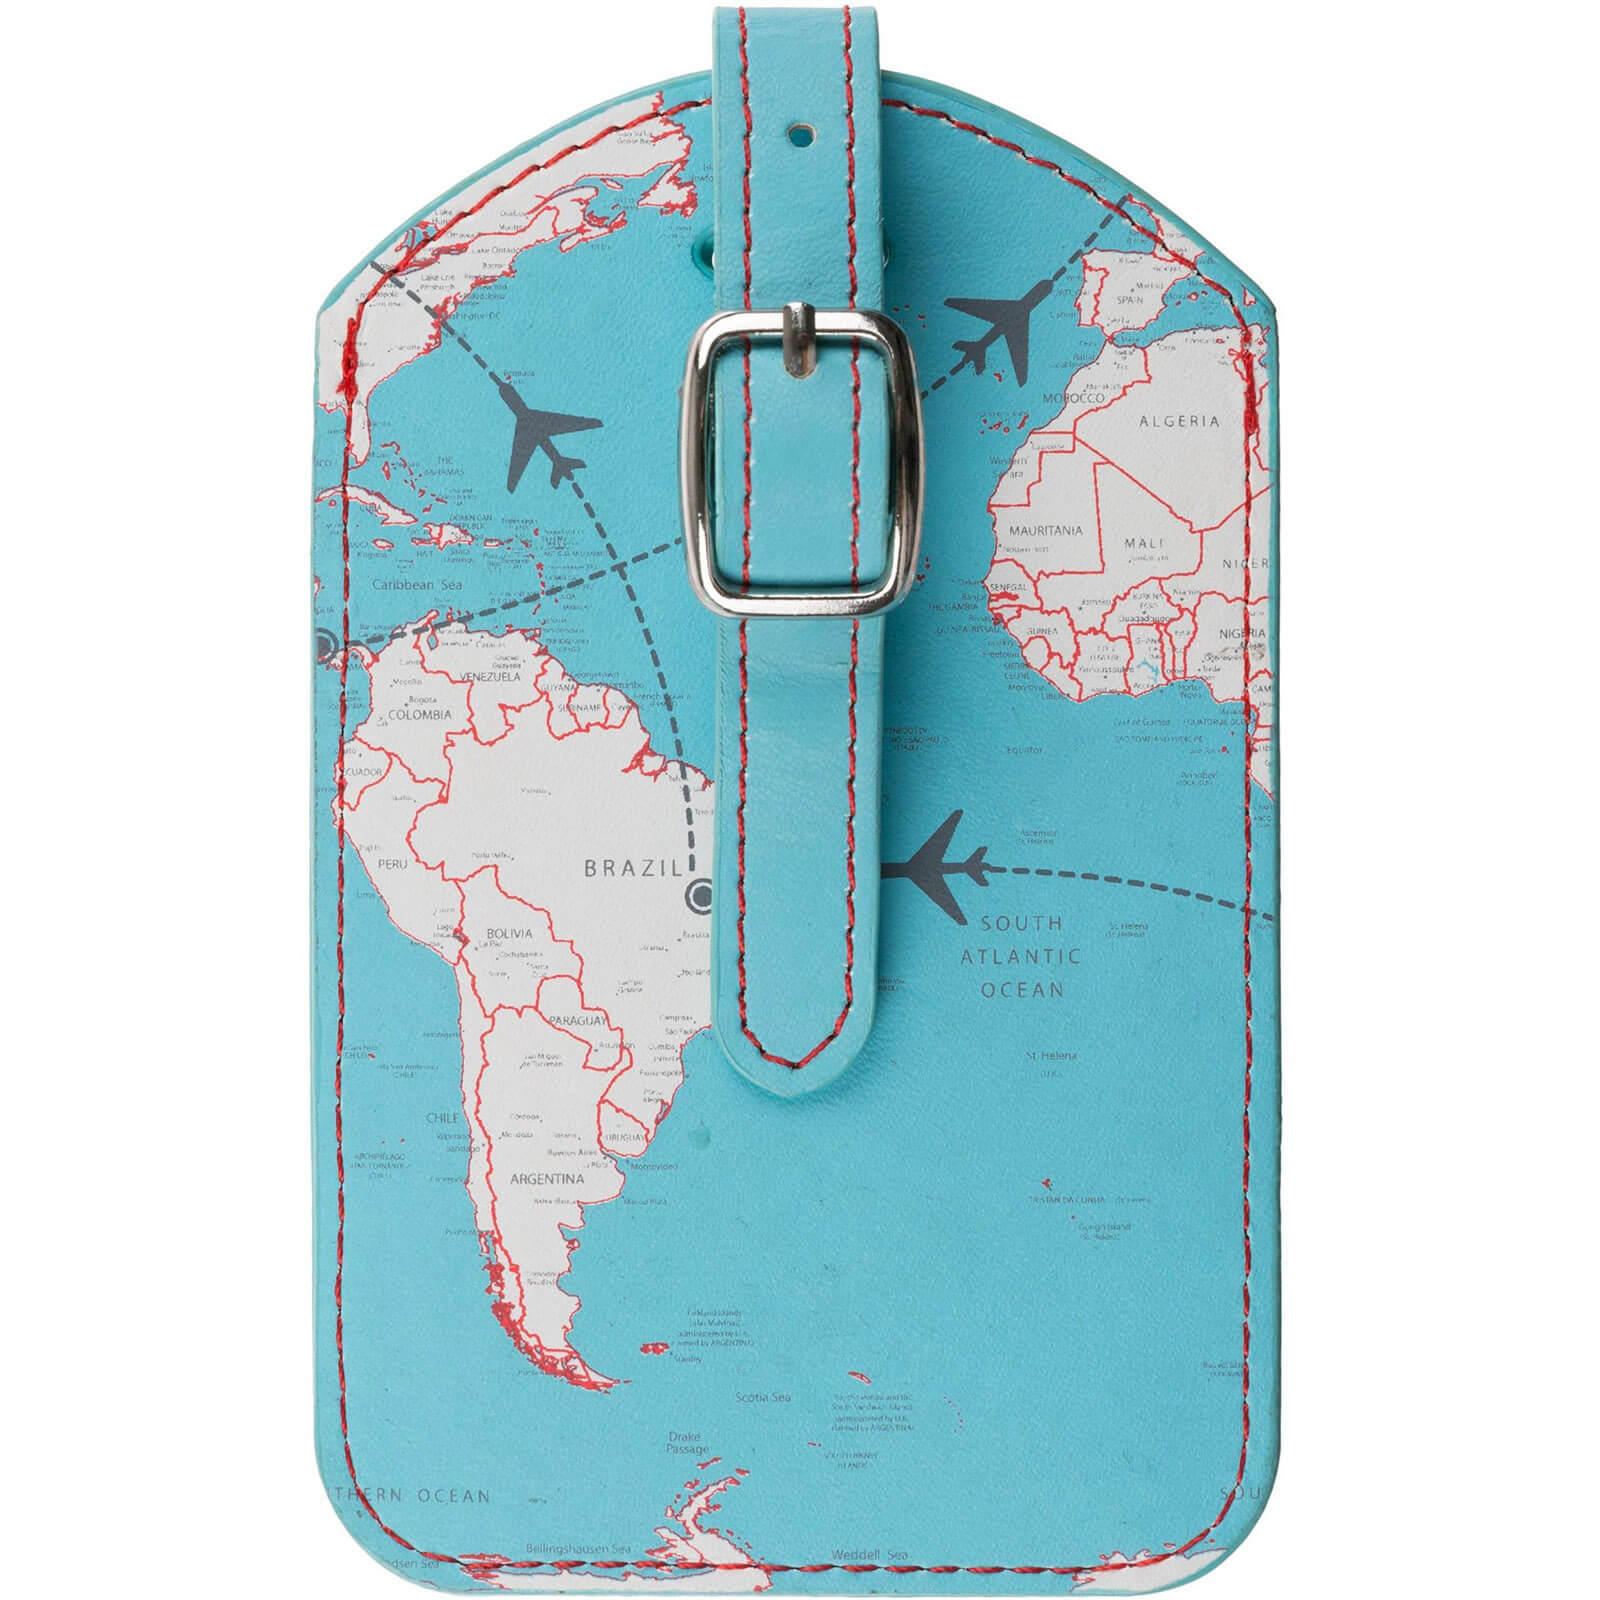 Trendz World Map Luggage Tag